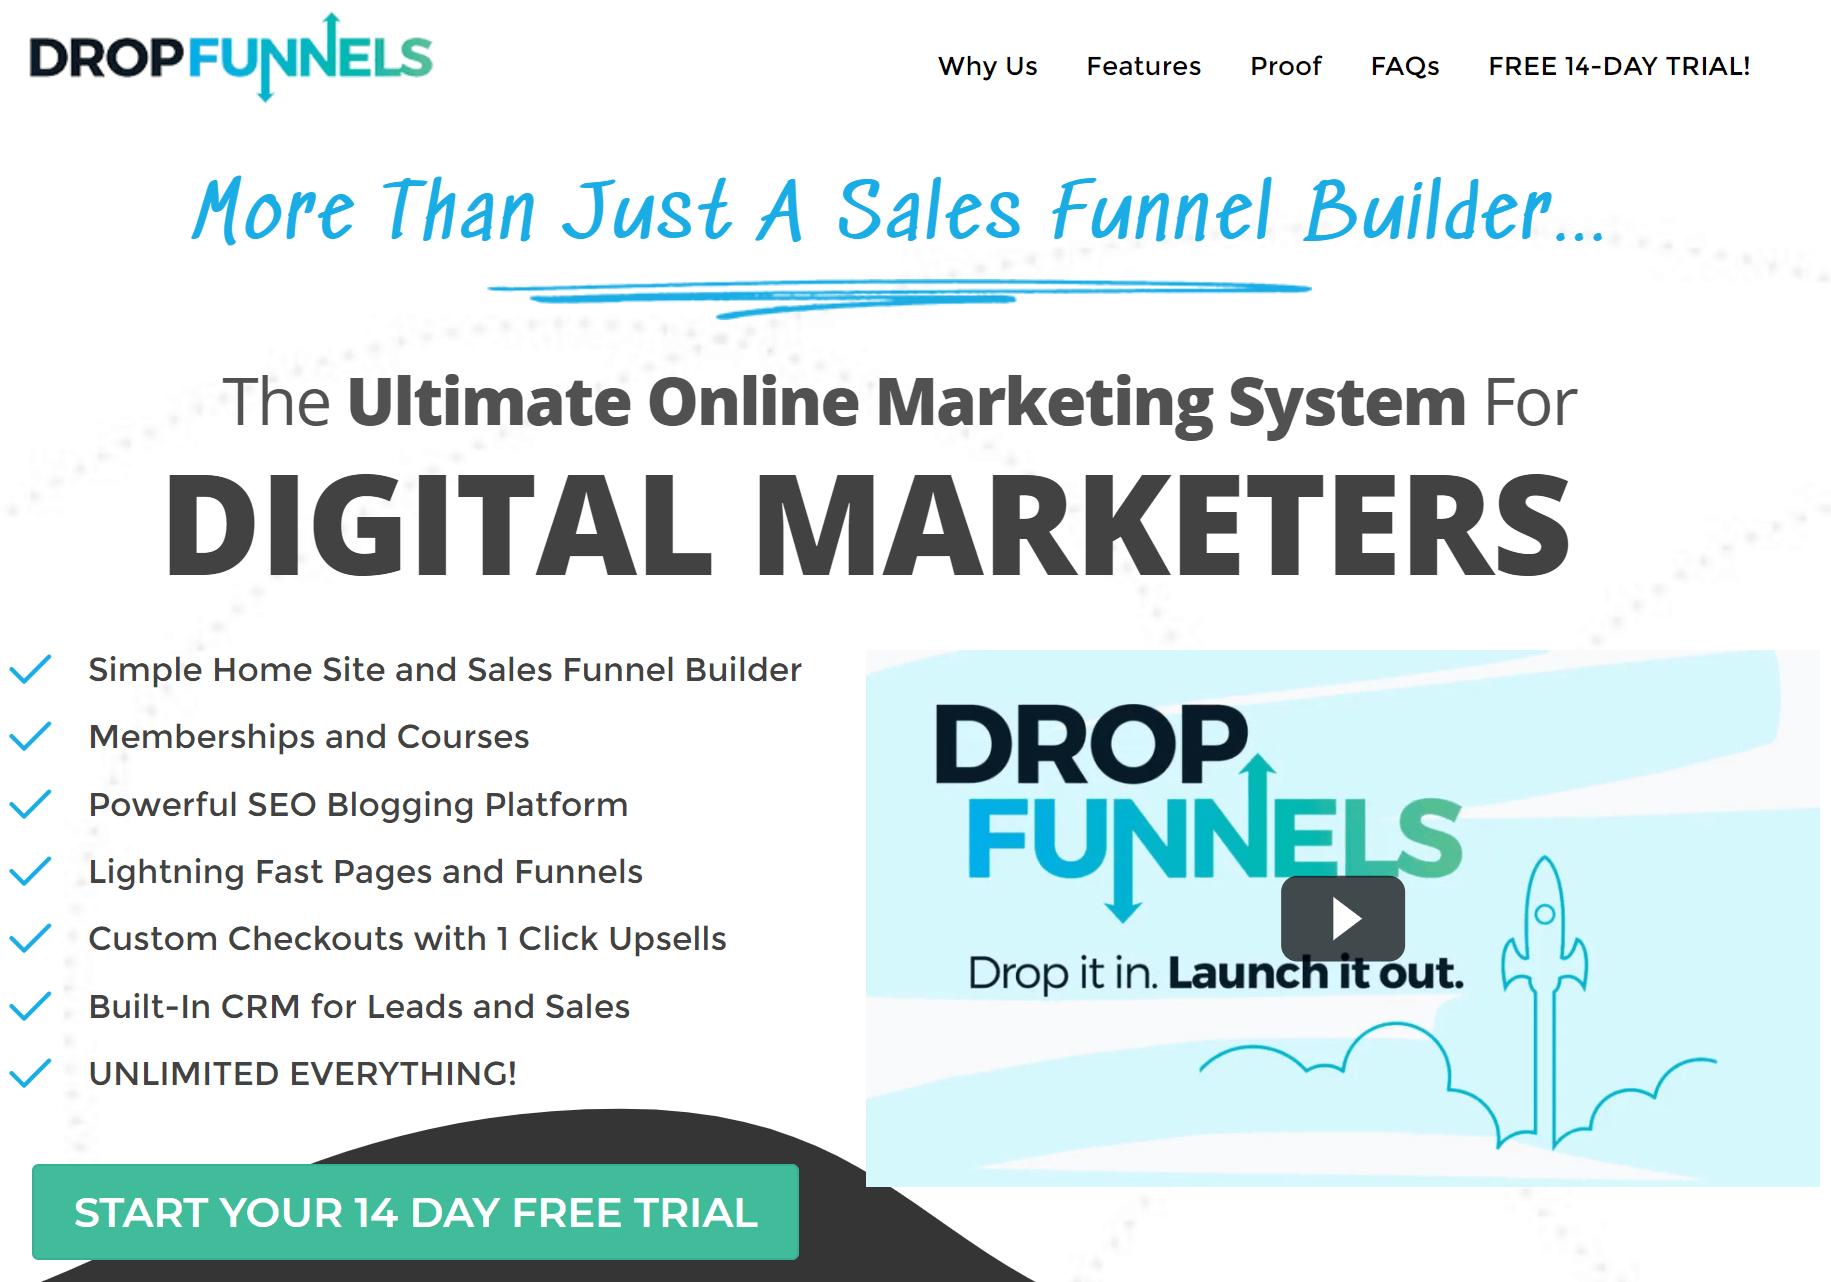 DropFunnels Best Sales Funnel Builder Software Home Page